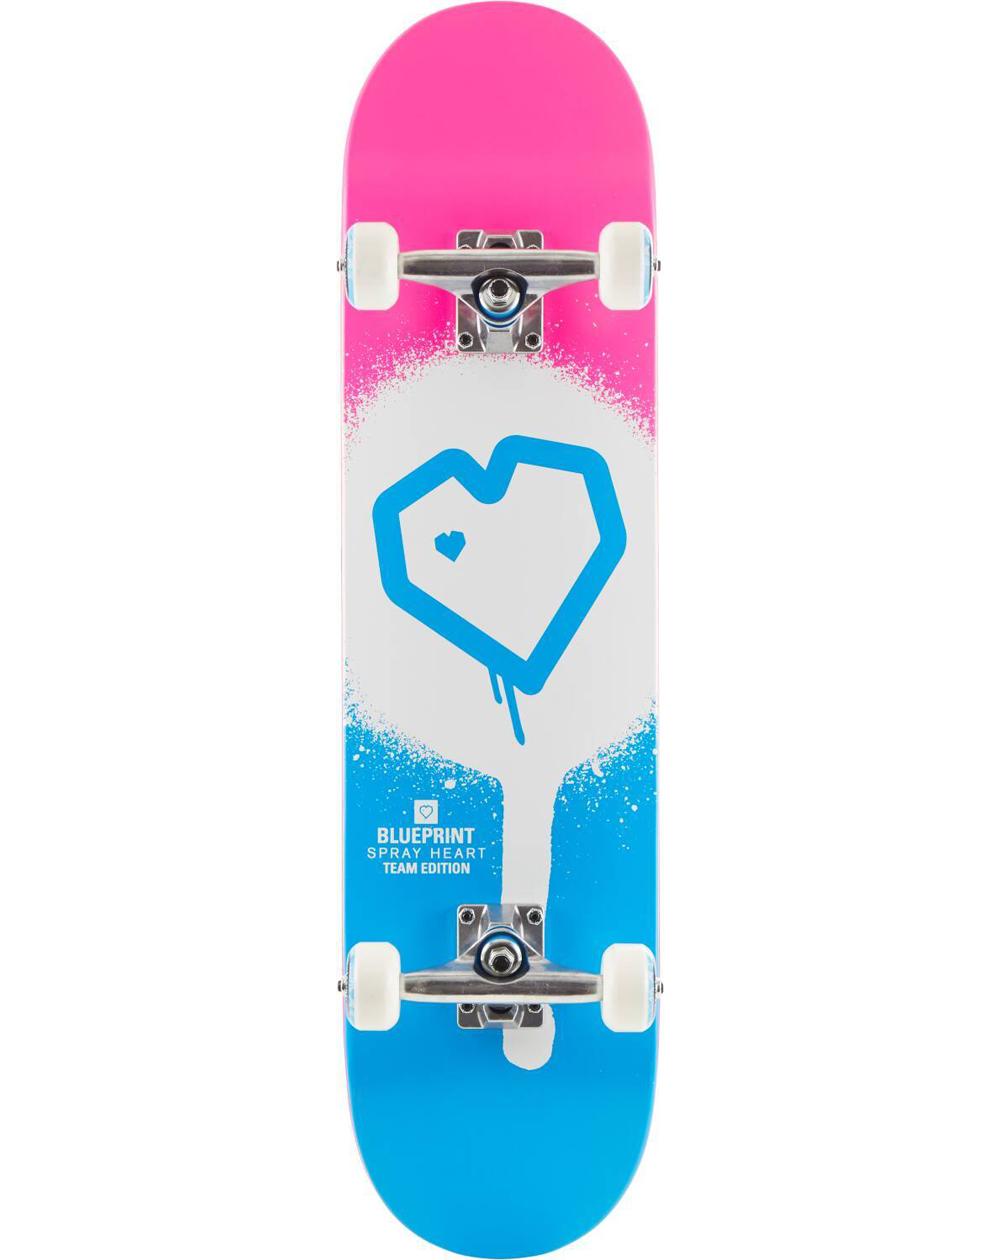 "Blueprint Spray Heart V2 8.25"" Complete Skateboard Blue/Pink"